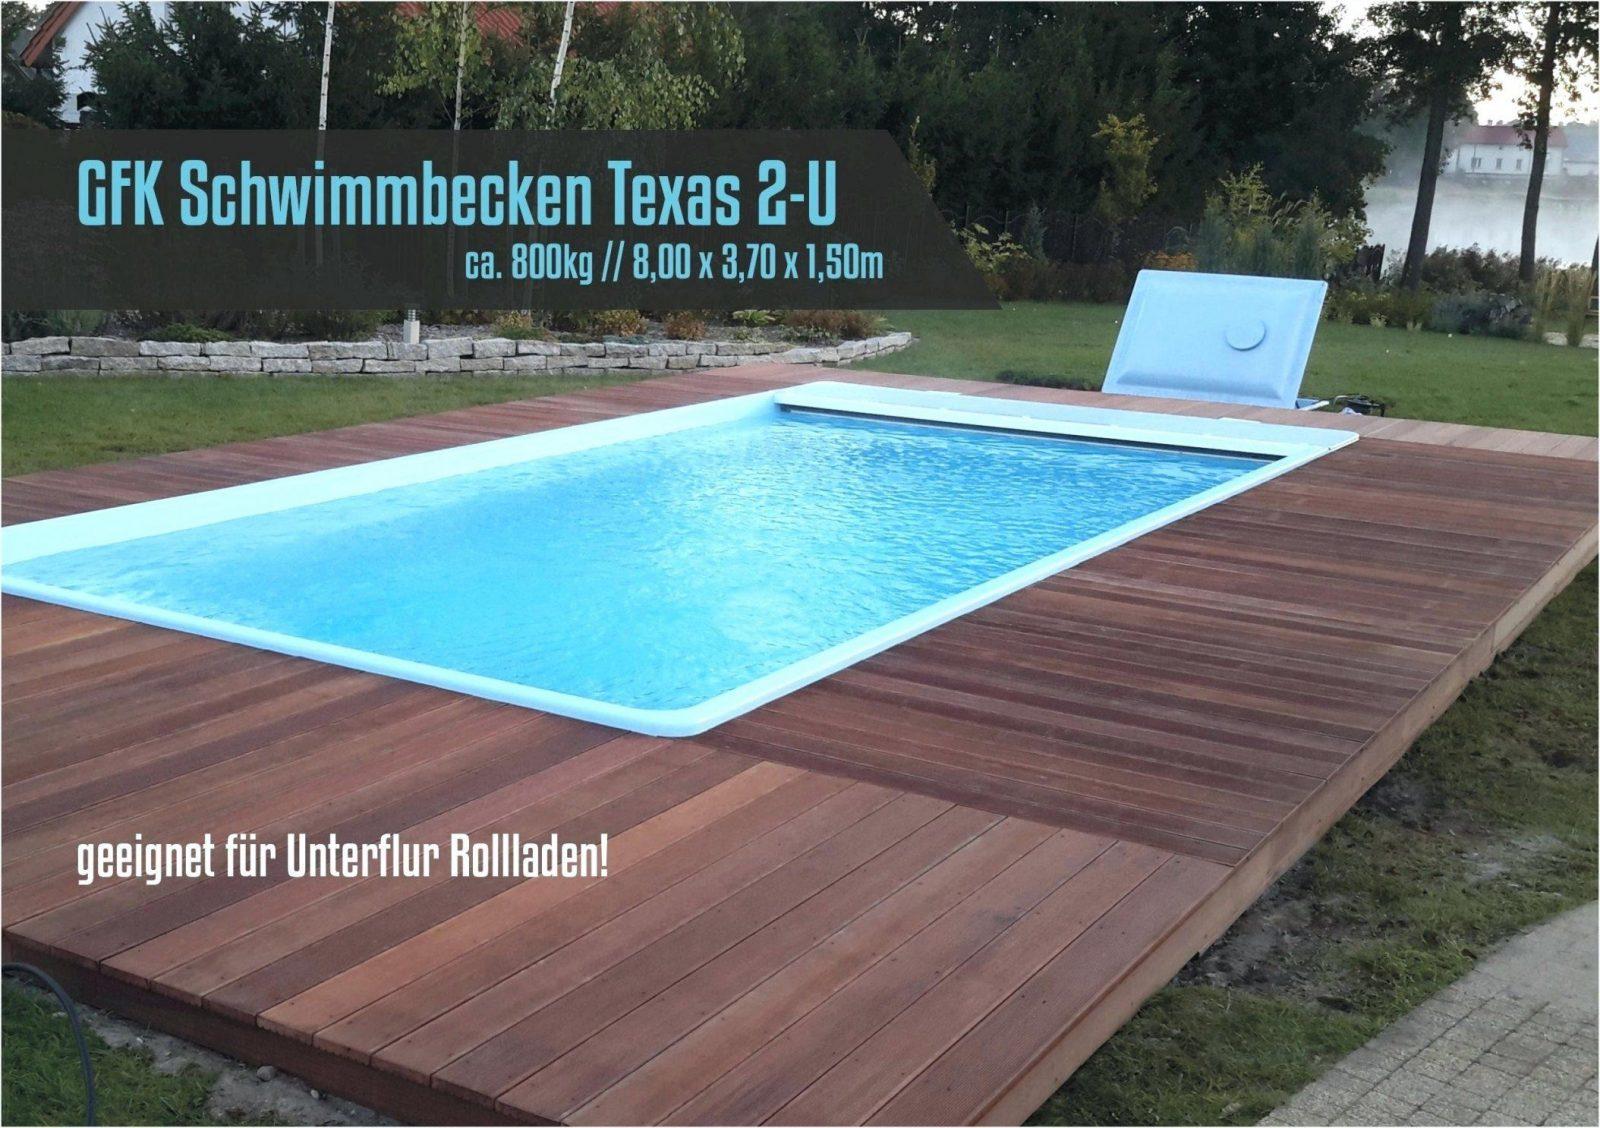 Pooluberdachung Selber Bauen Luxus Glasfaser Pool Beautiful Holz von Poolüberdachung Selber Bauen Rundpool Photo